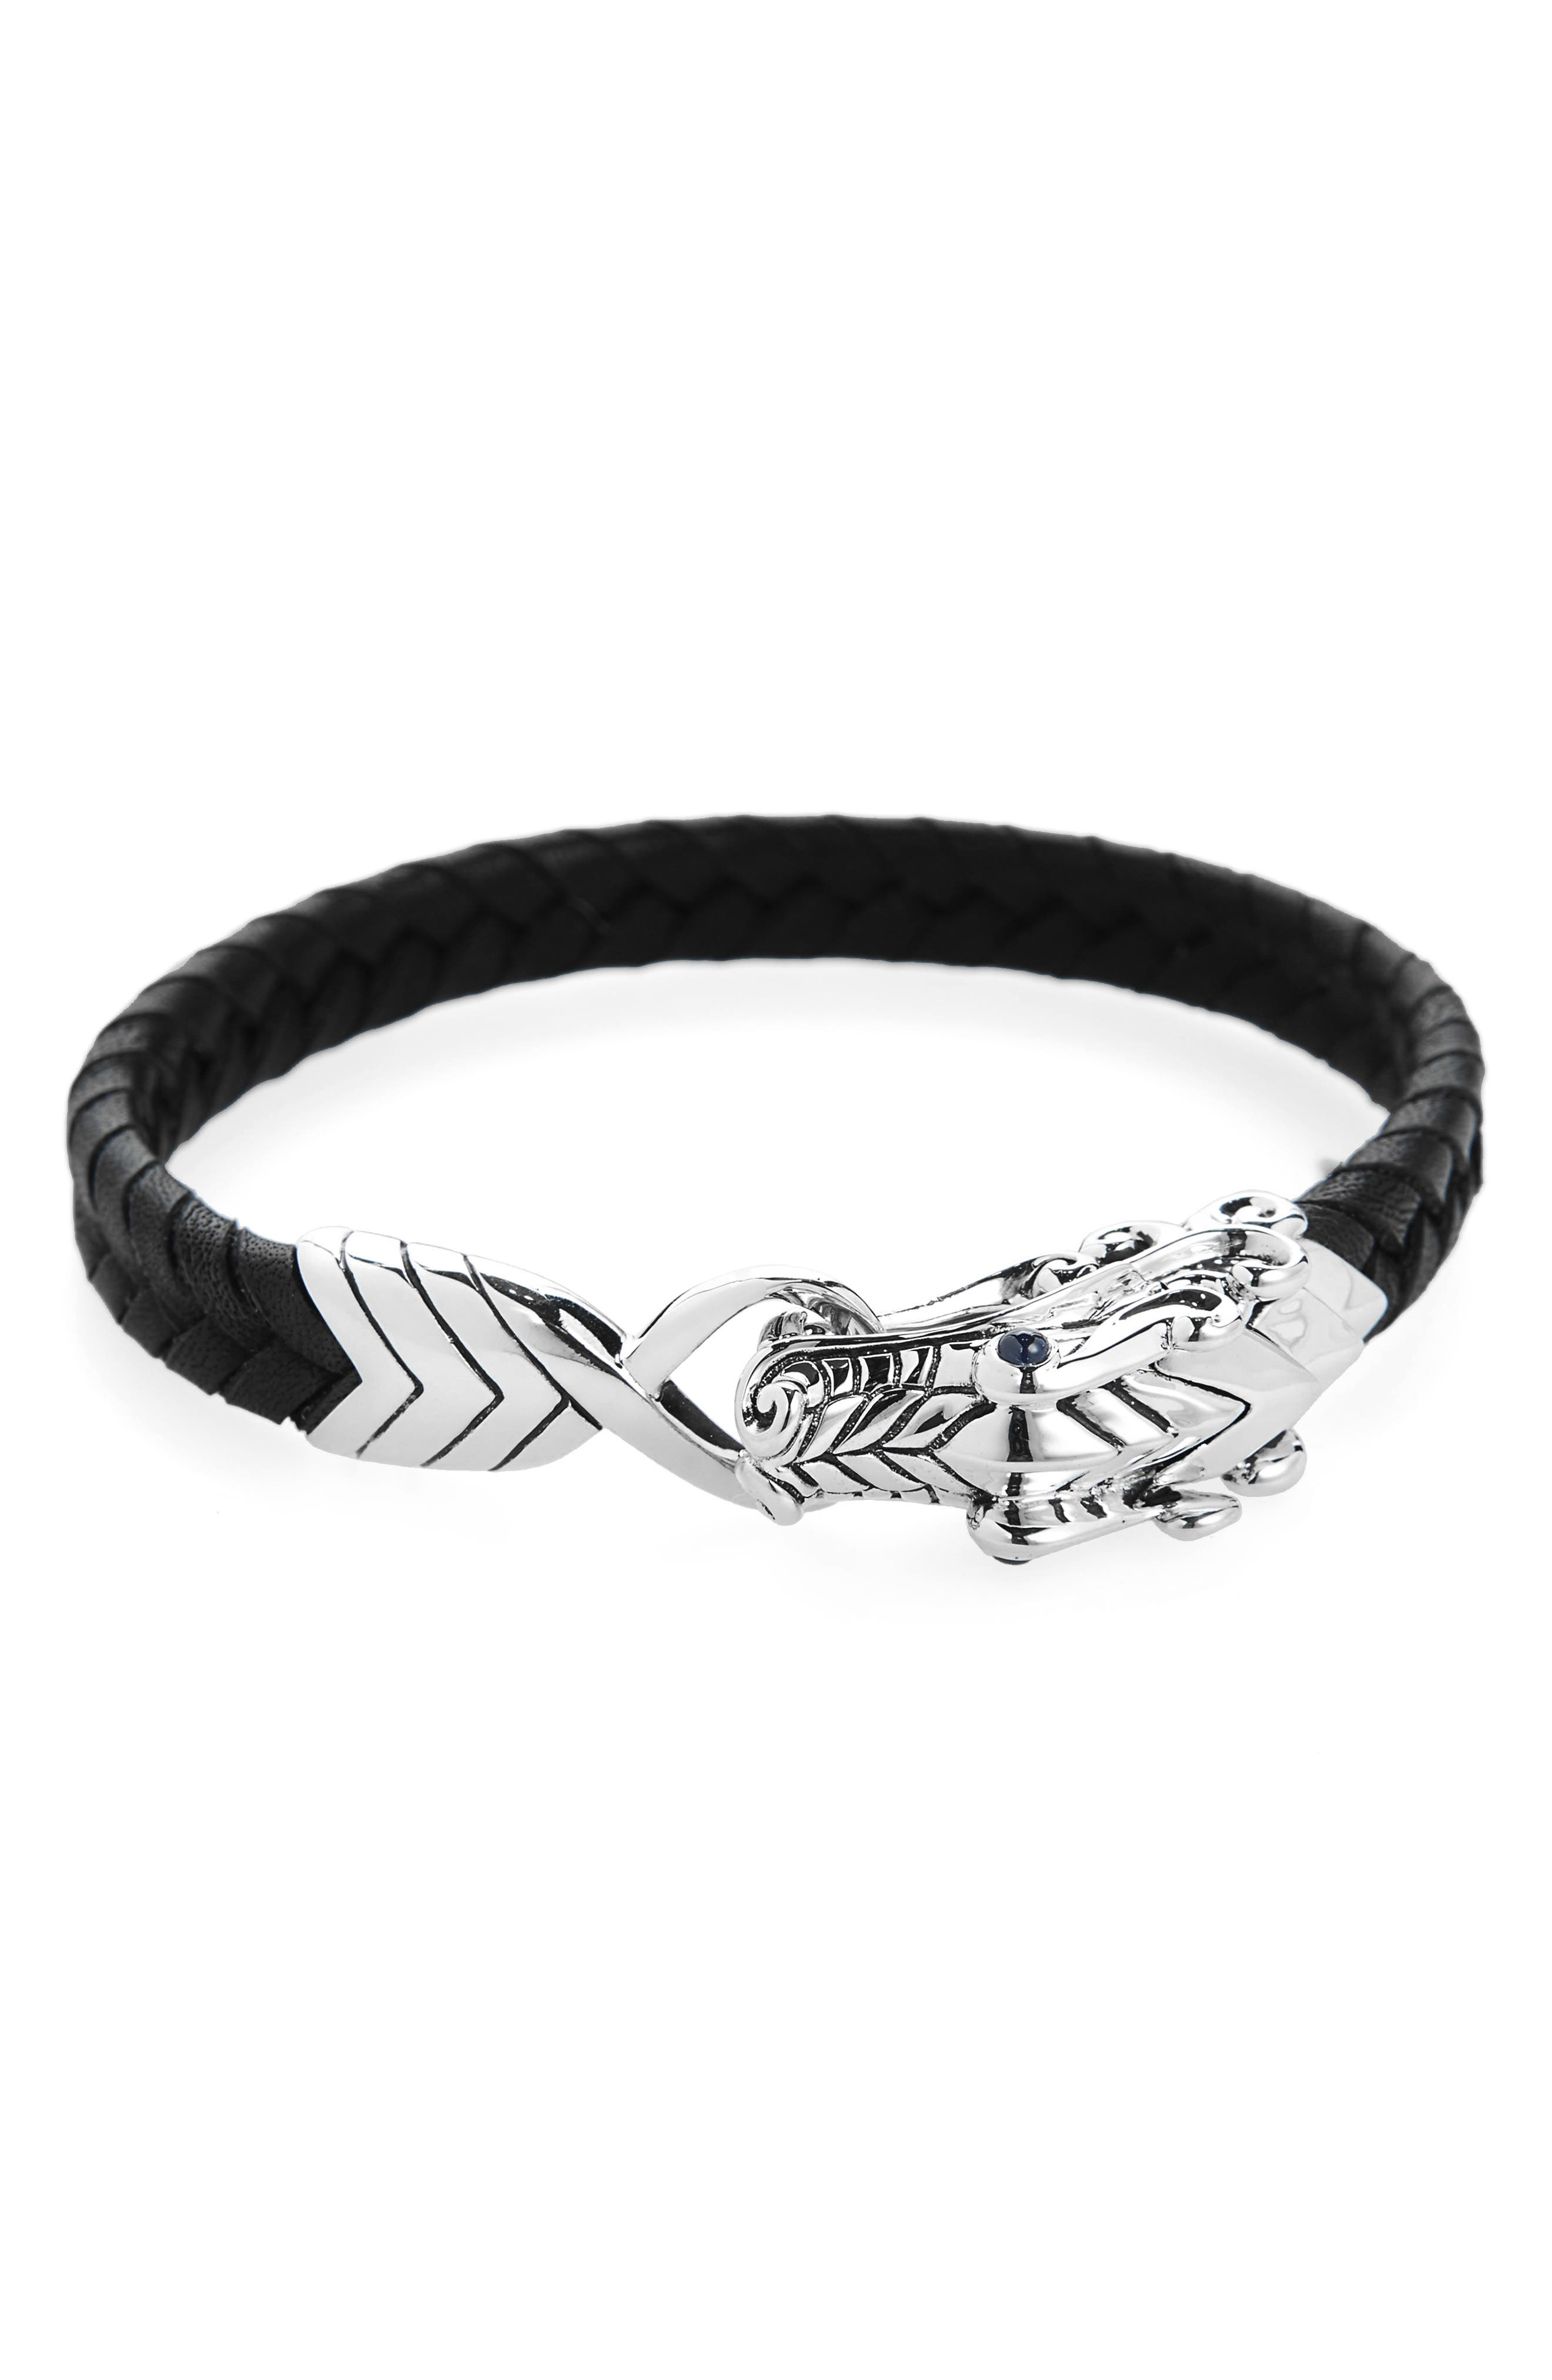 Legends Naga Bracelet,                             Main thumbnail 1, color,                             Black